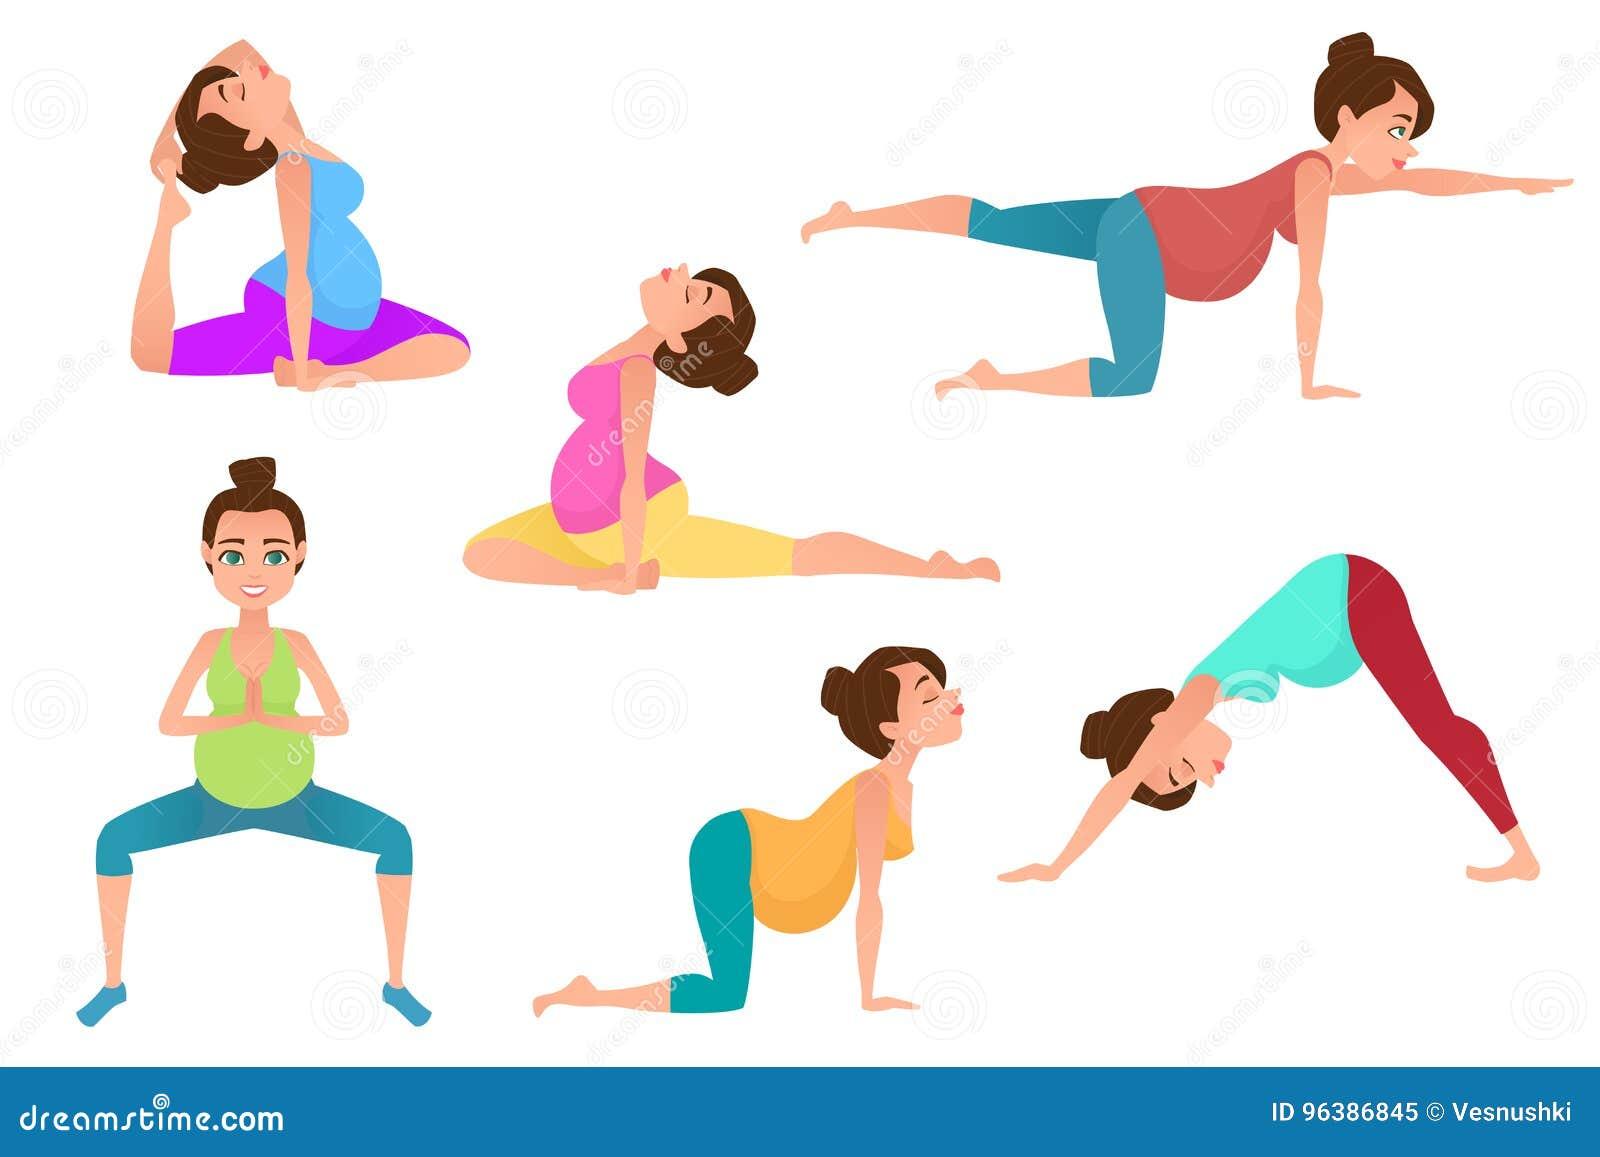 Young Pregnancy Woman Meditation In Yoga Poses Stock Vector Illustration Of Dasa Abdomen 96386845